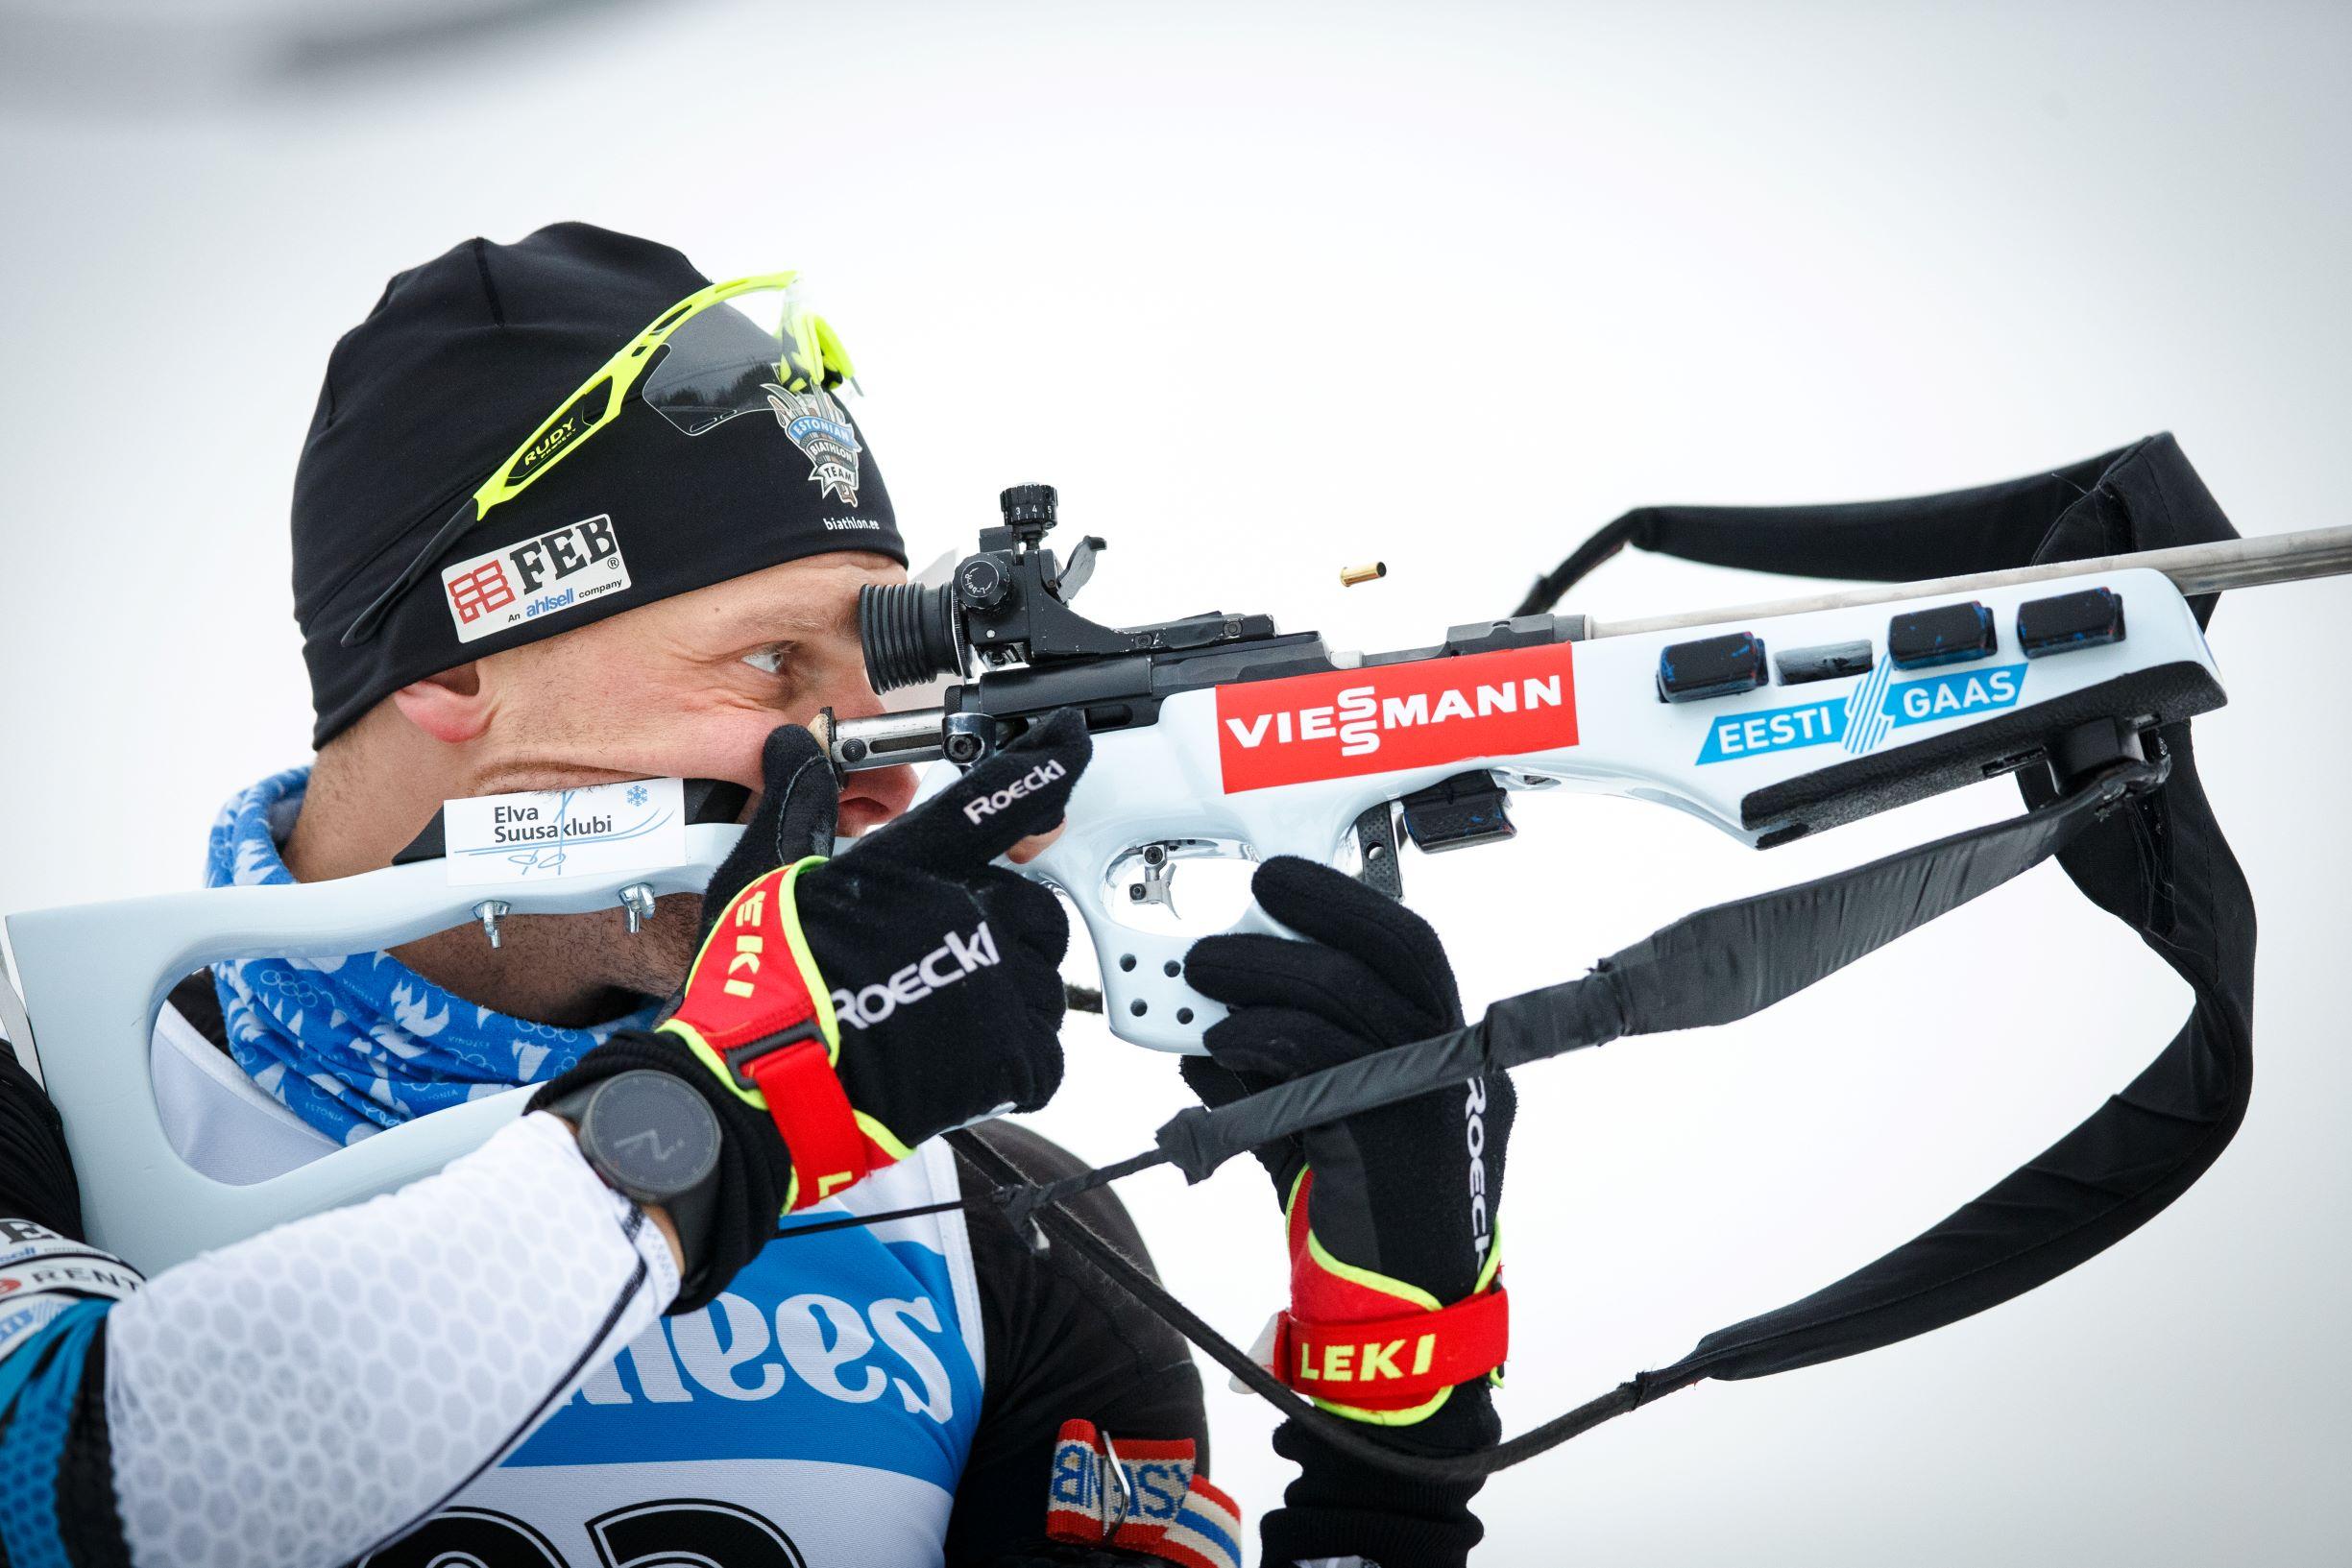 Eesti Gaas уже 10 лет является спонсором Федерации по Биатлону, фото Jarek Jõepera